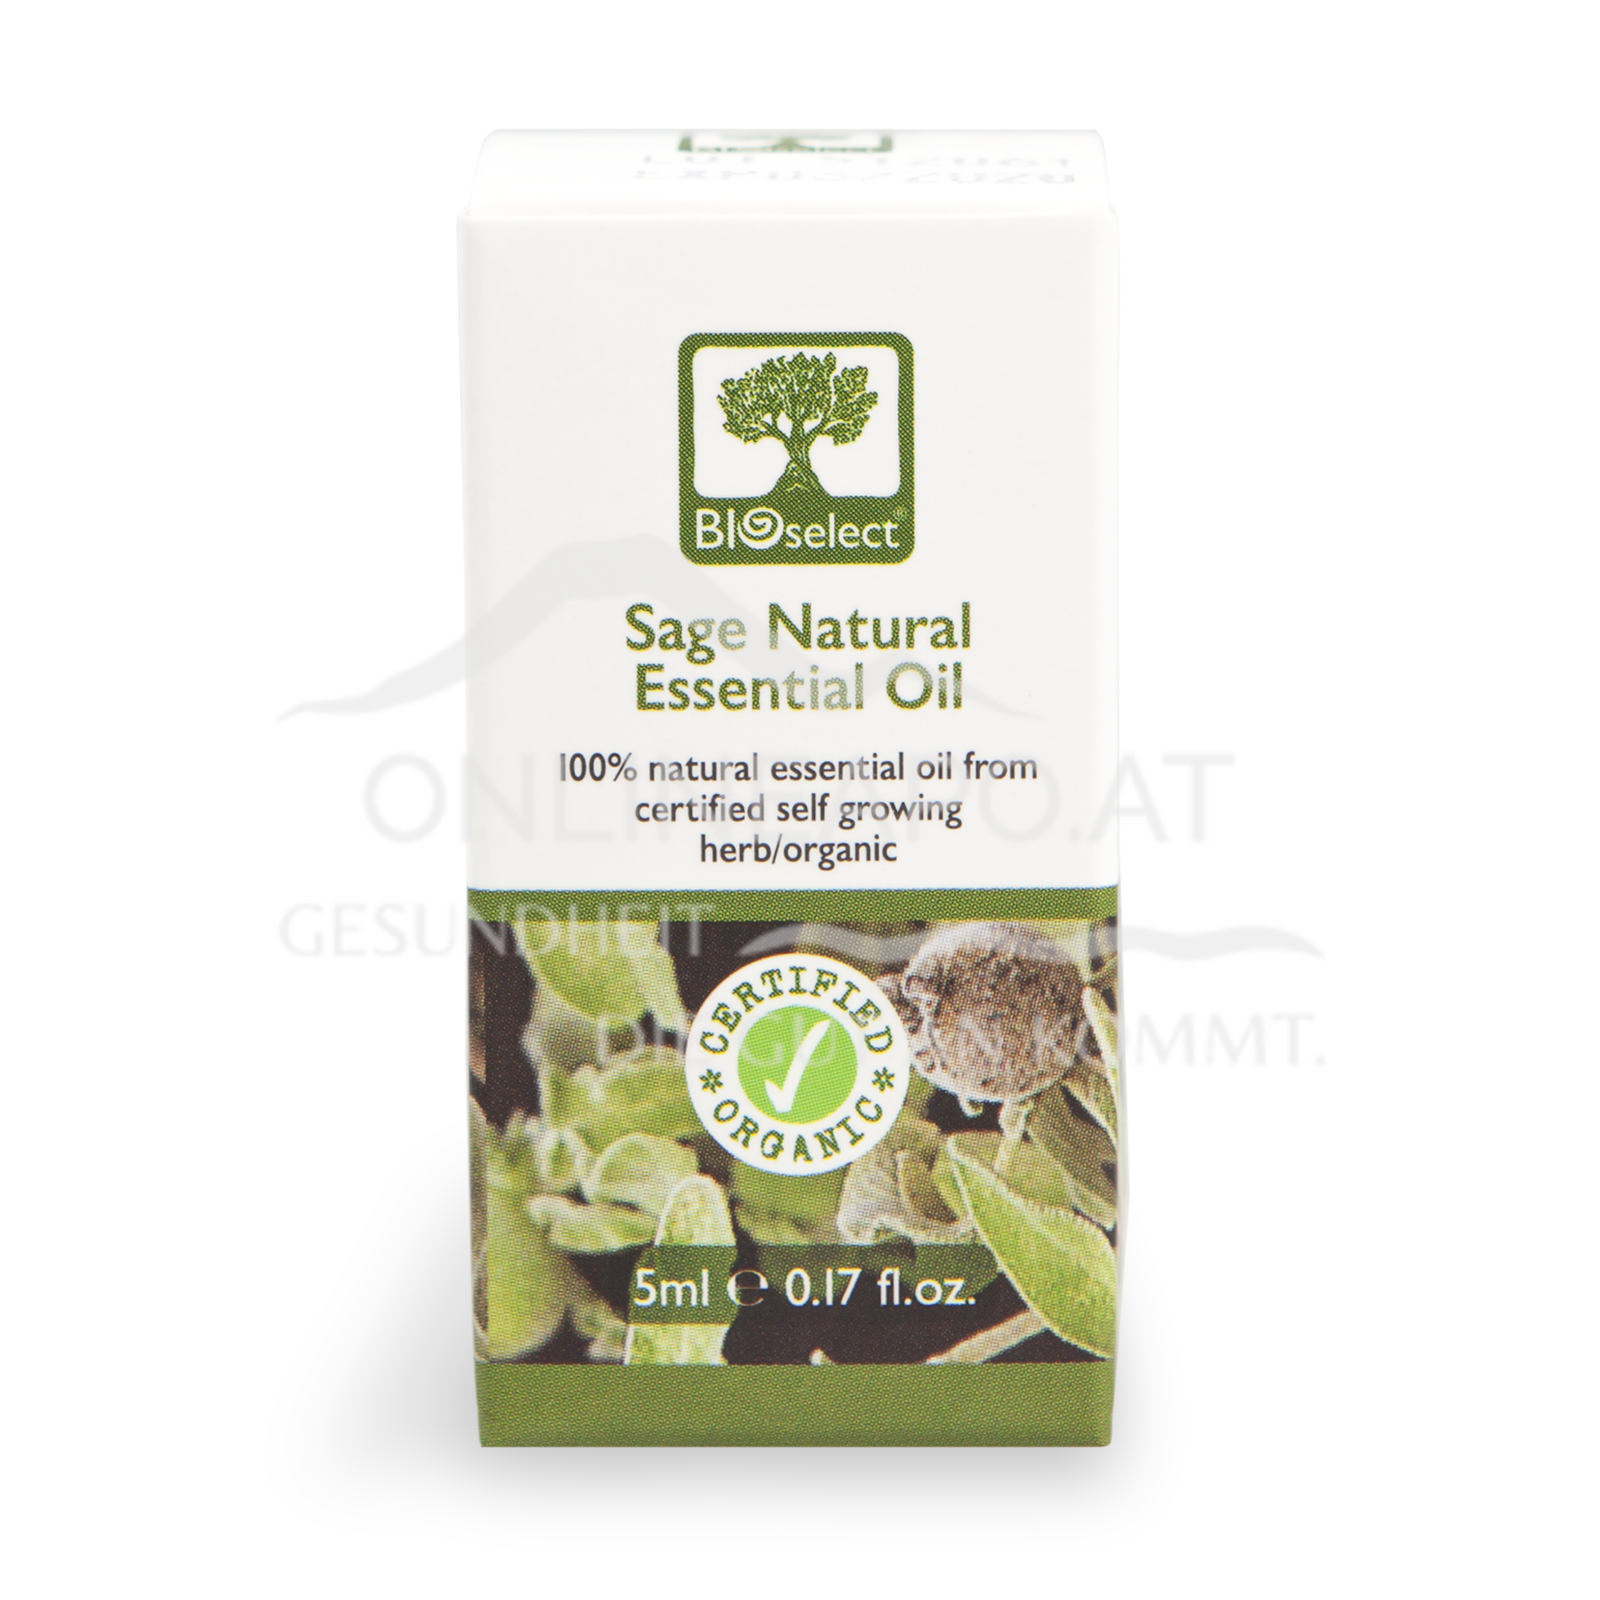 Bioselect Sage Natural Essential Oil Certified Organic